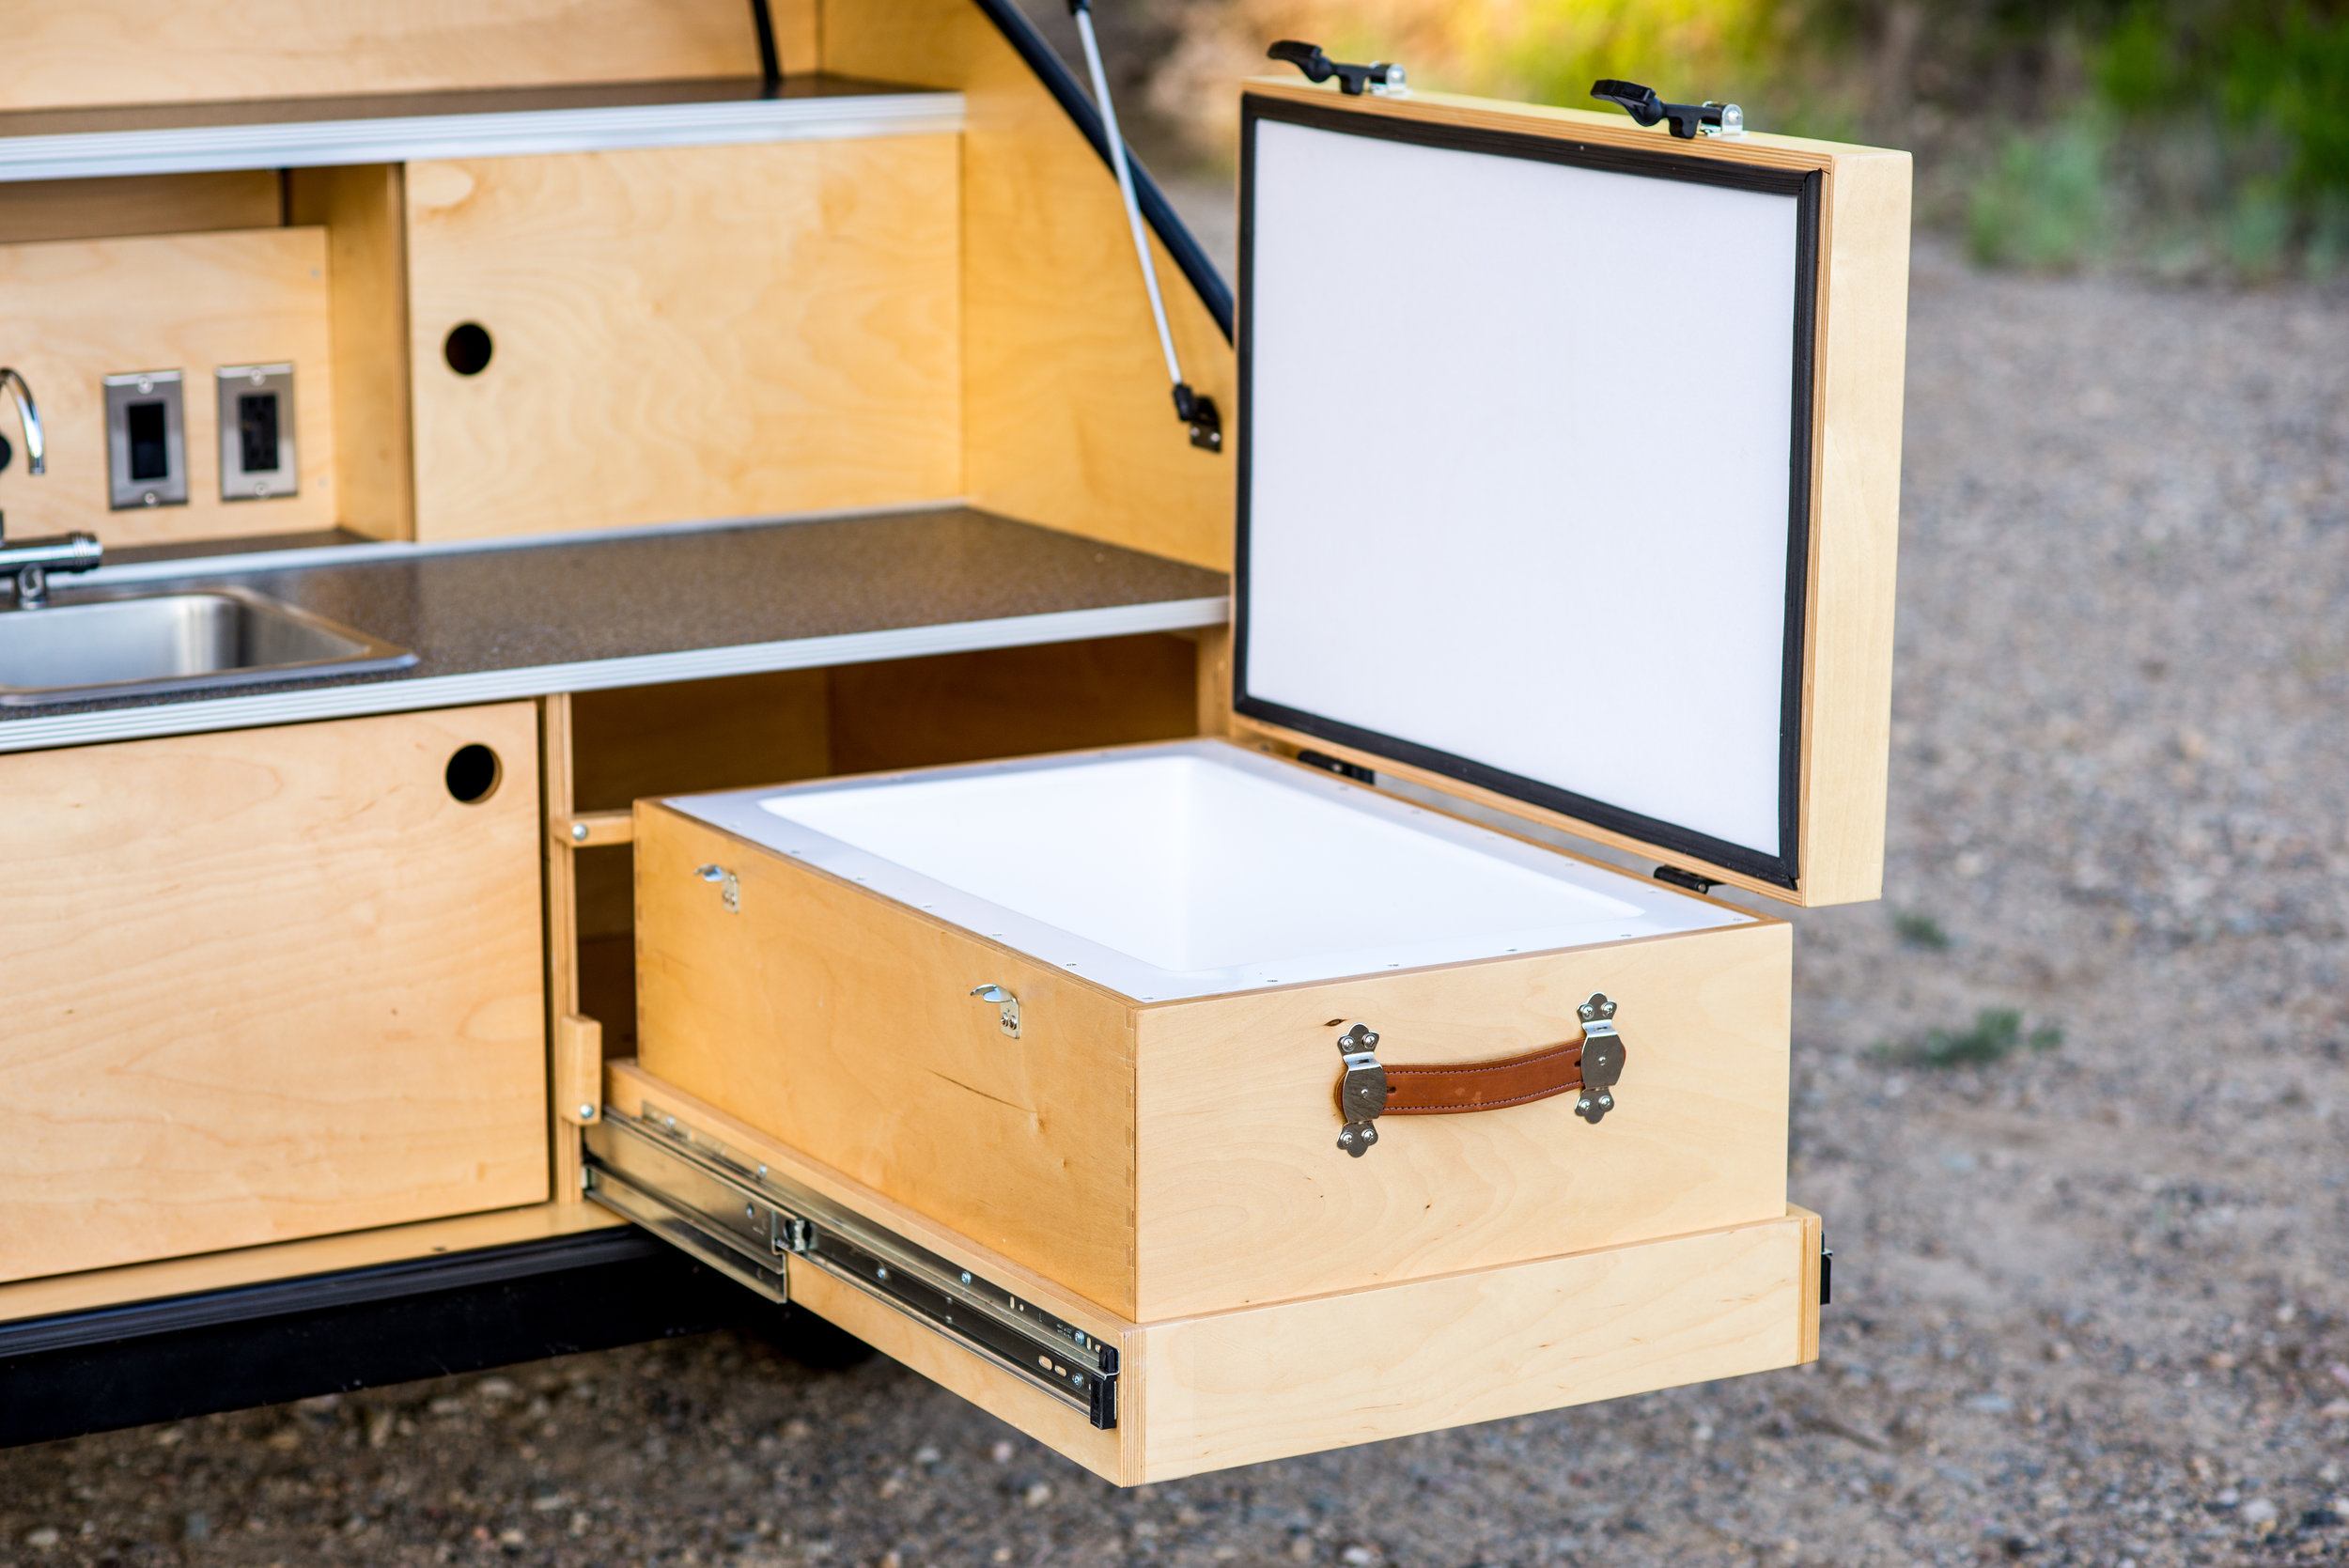 Custom made cooler for teardrop trailer.